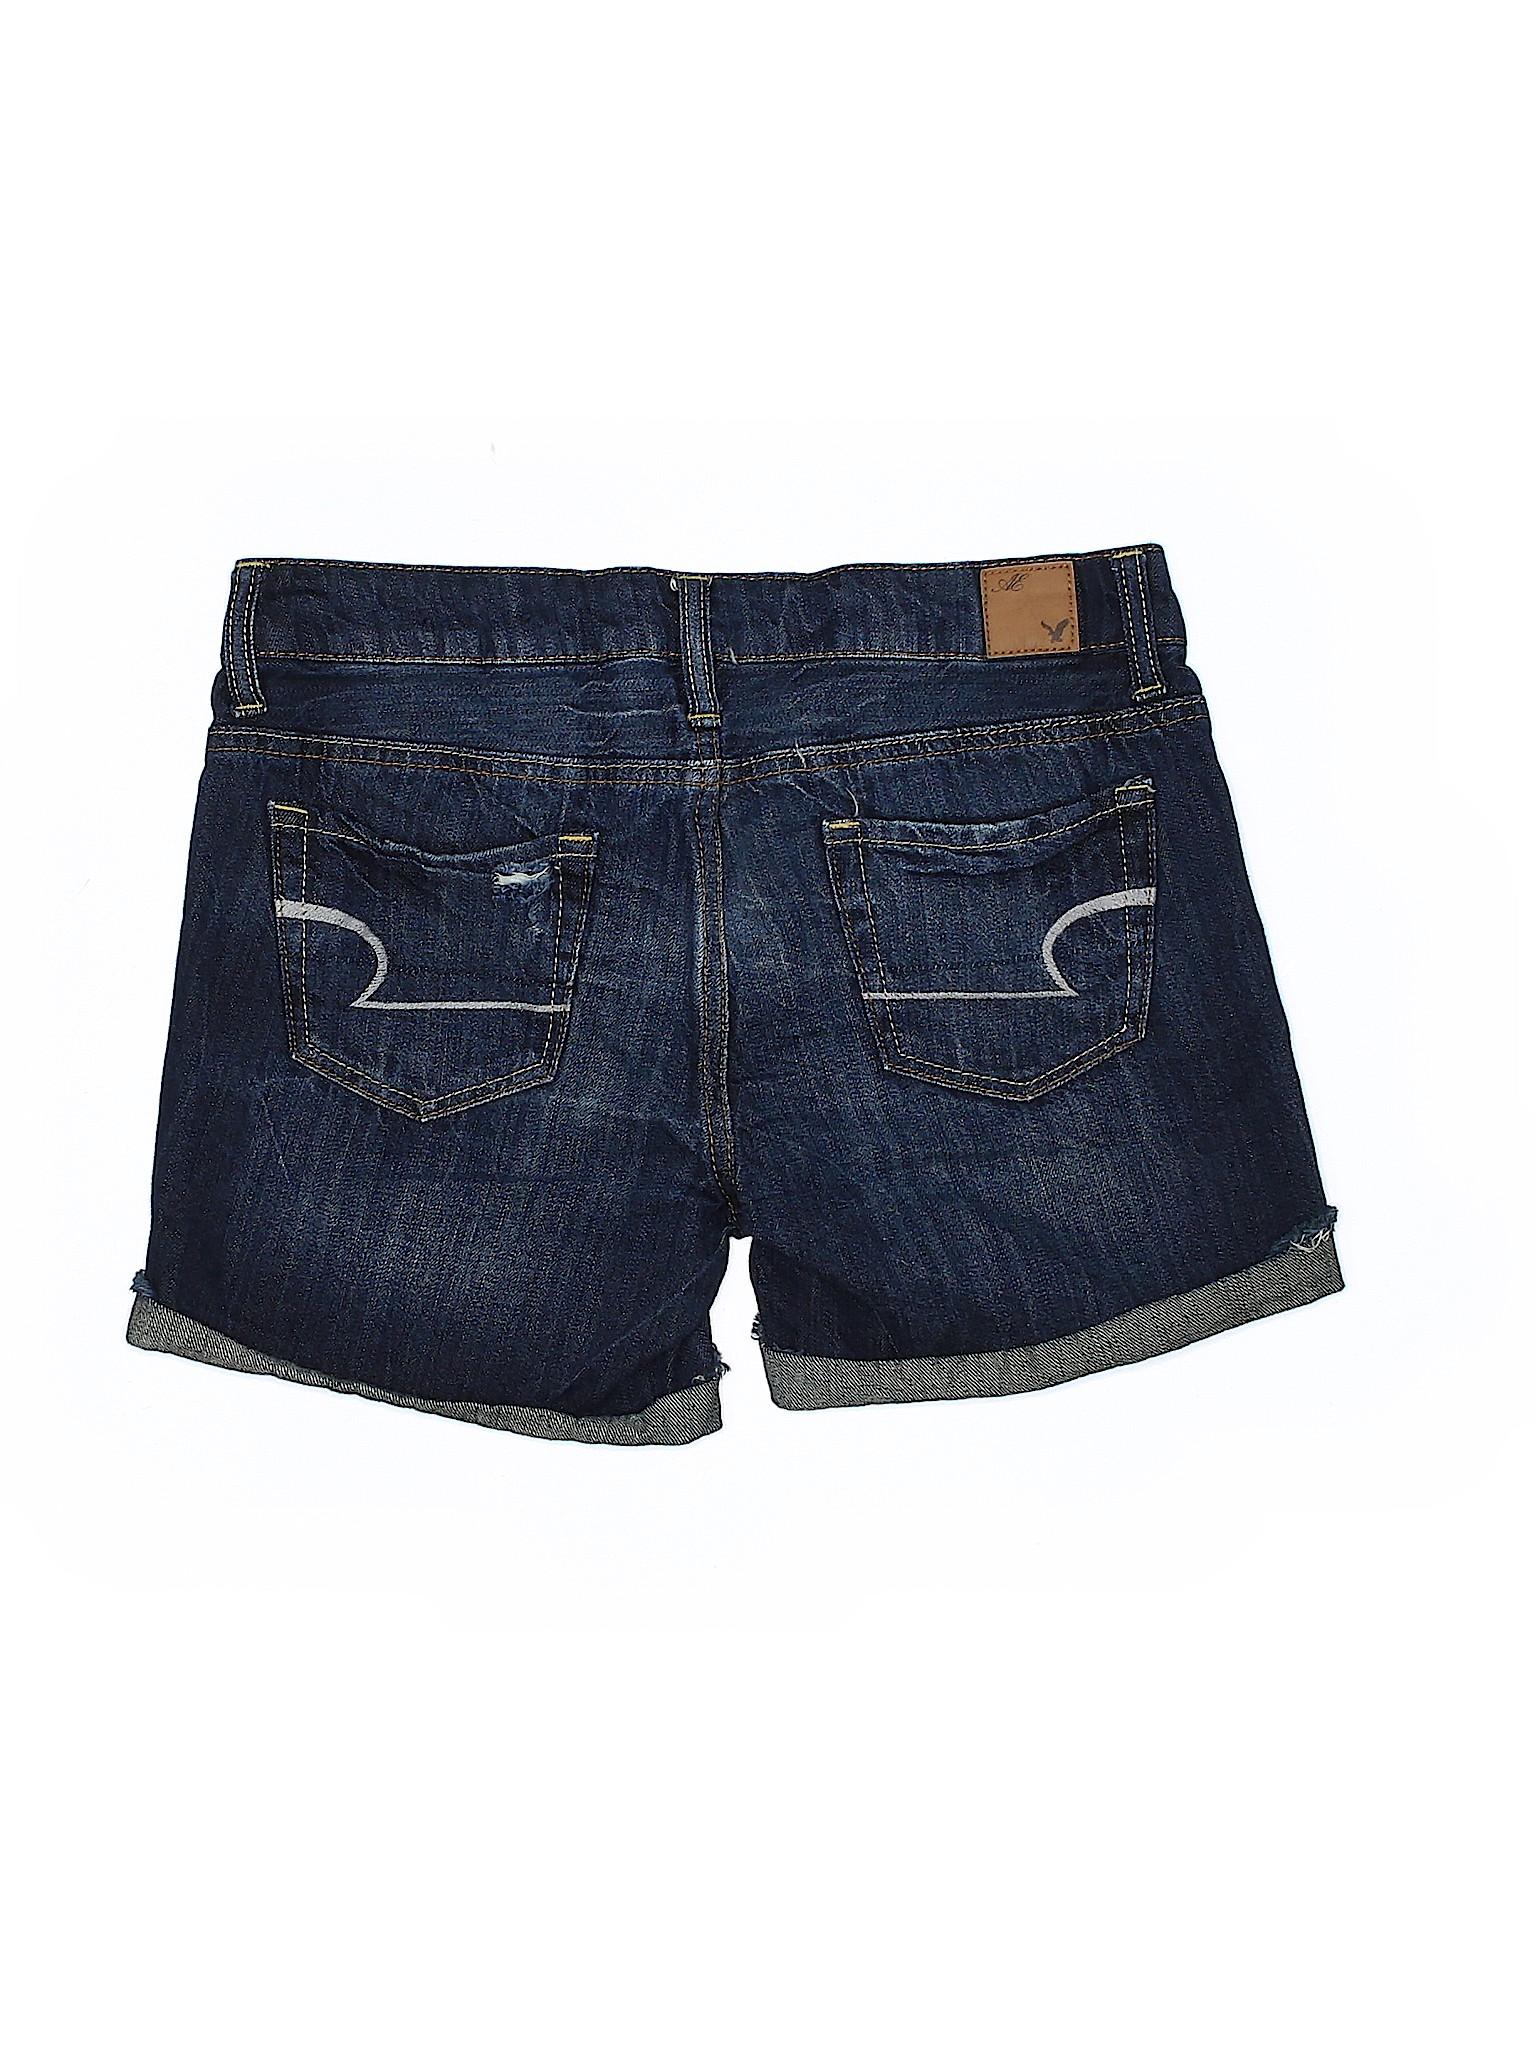 Eagle Outfitters Boutique Denim American Shorts H5wqOFxz